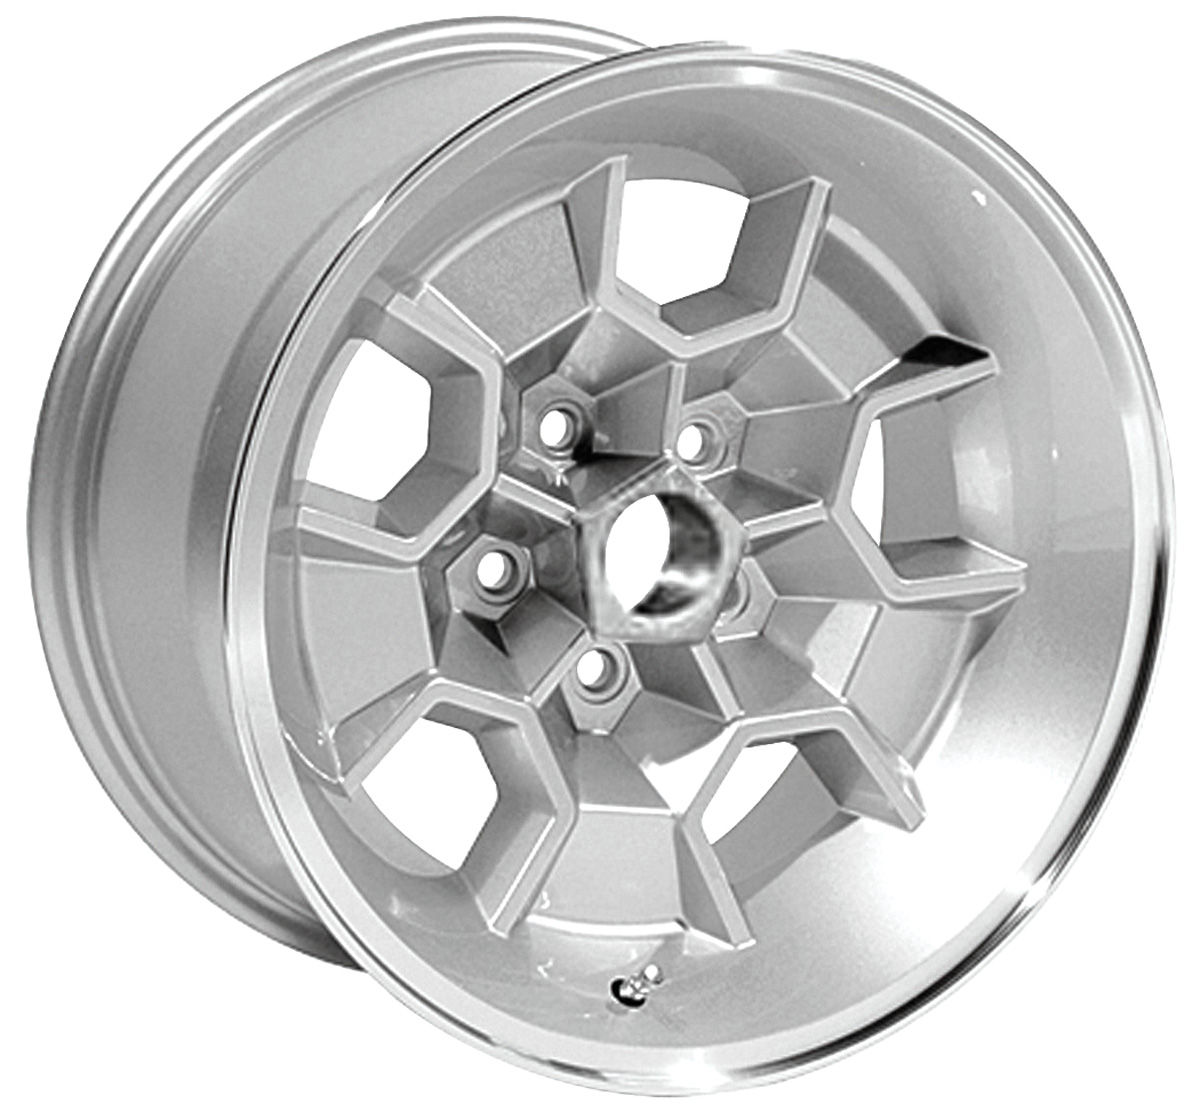 "Honeycomb Wheel, 1971-72 GTO, 17x9"", 5-1/8"" BS"